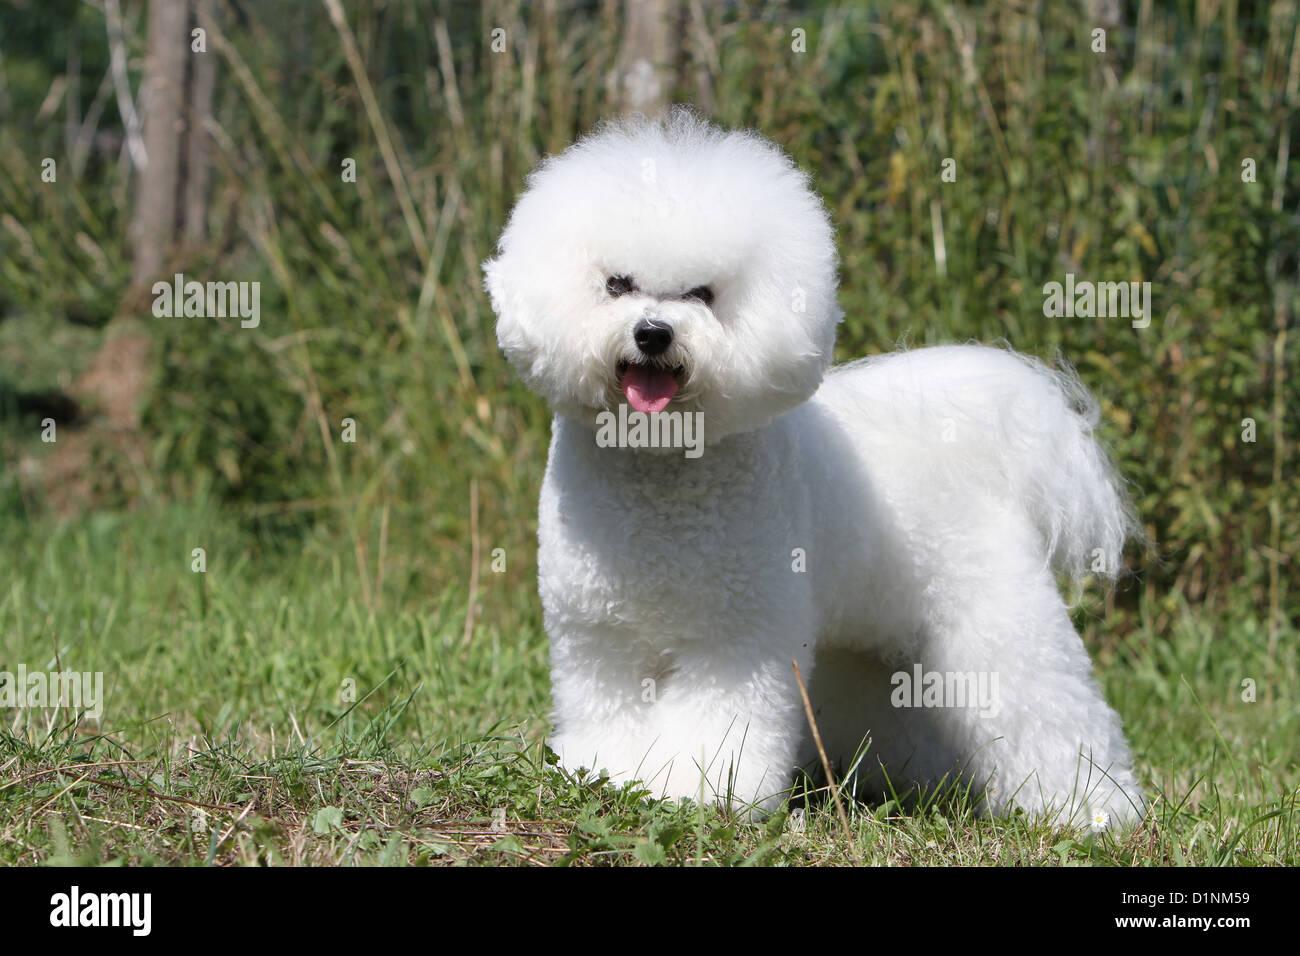 Dog Bichon Frise adult standard profile